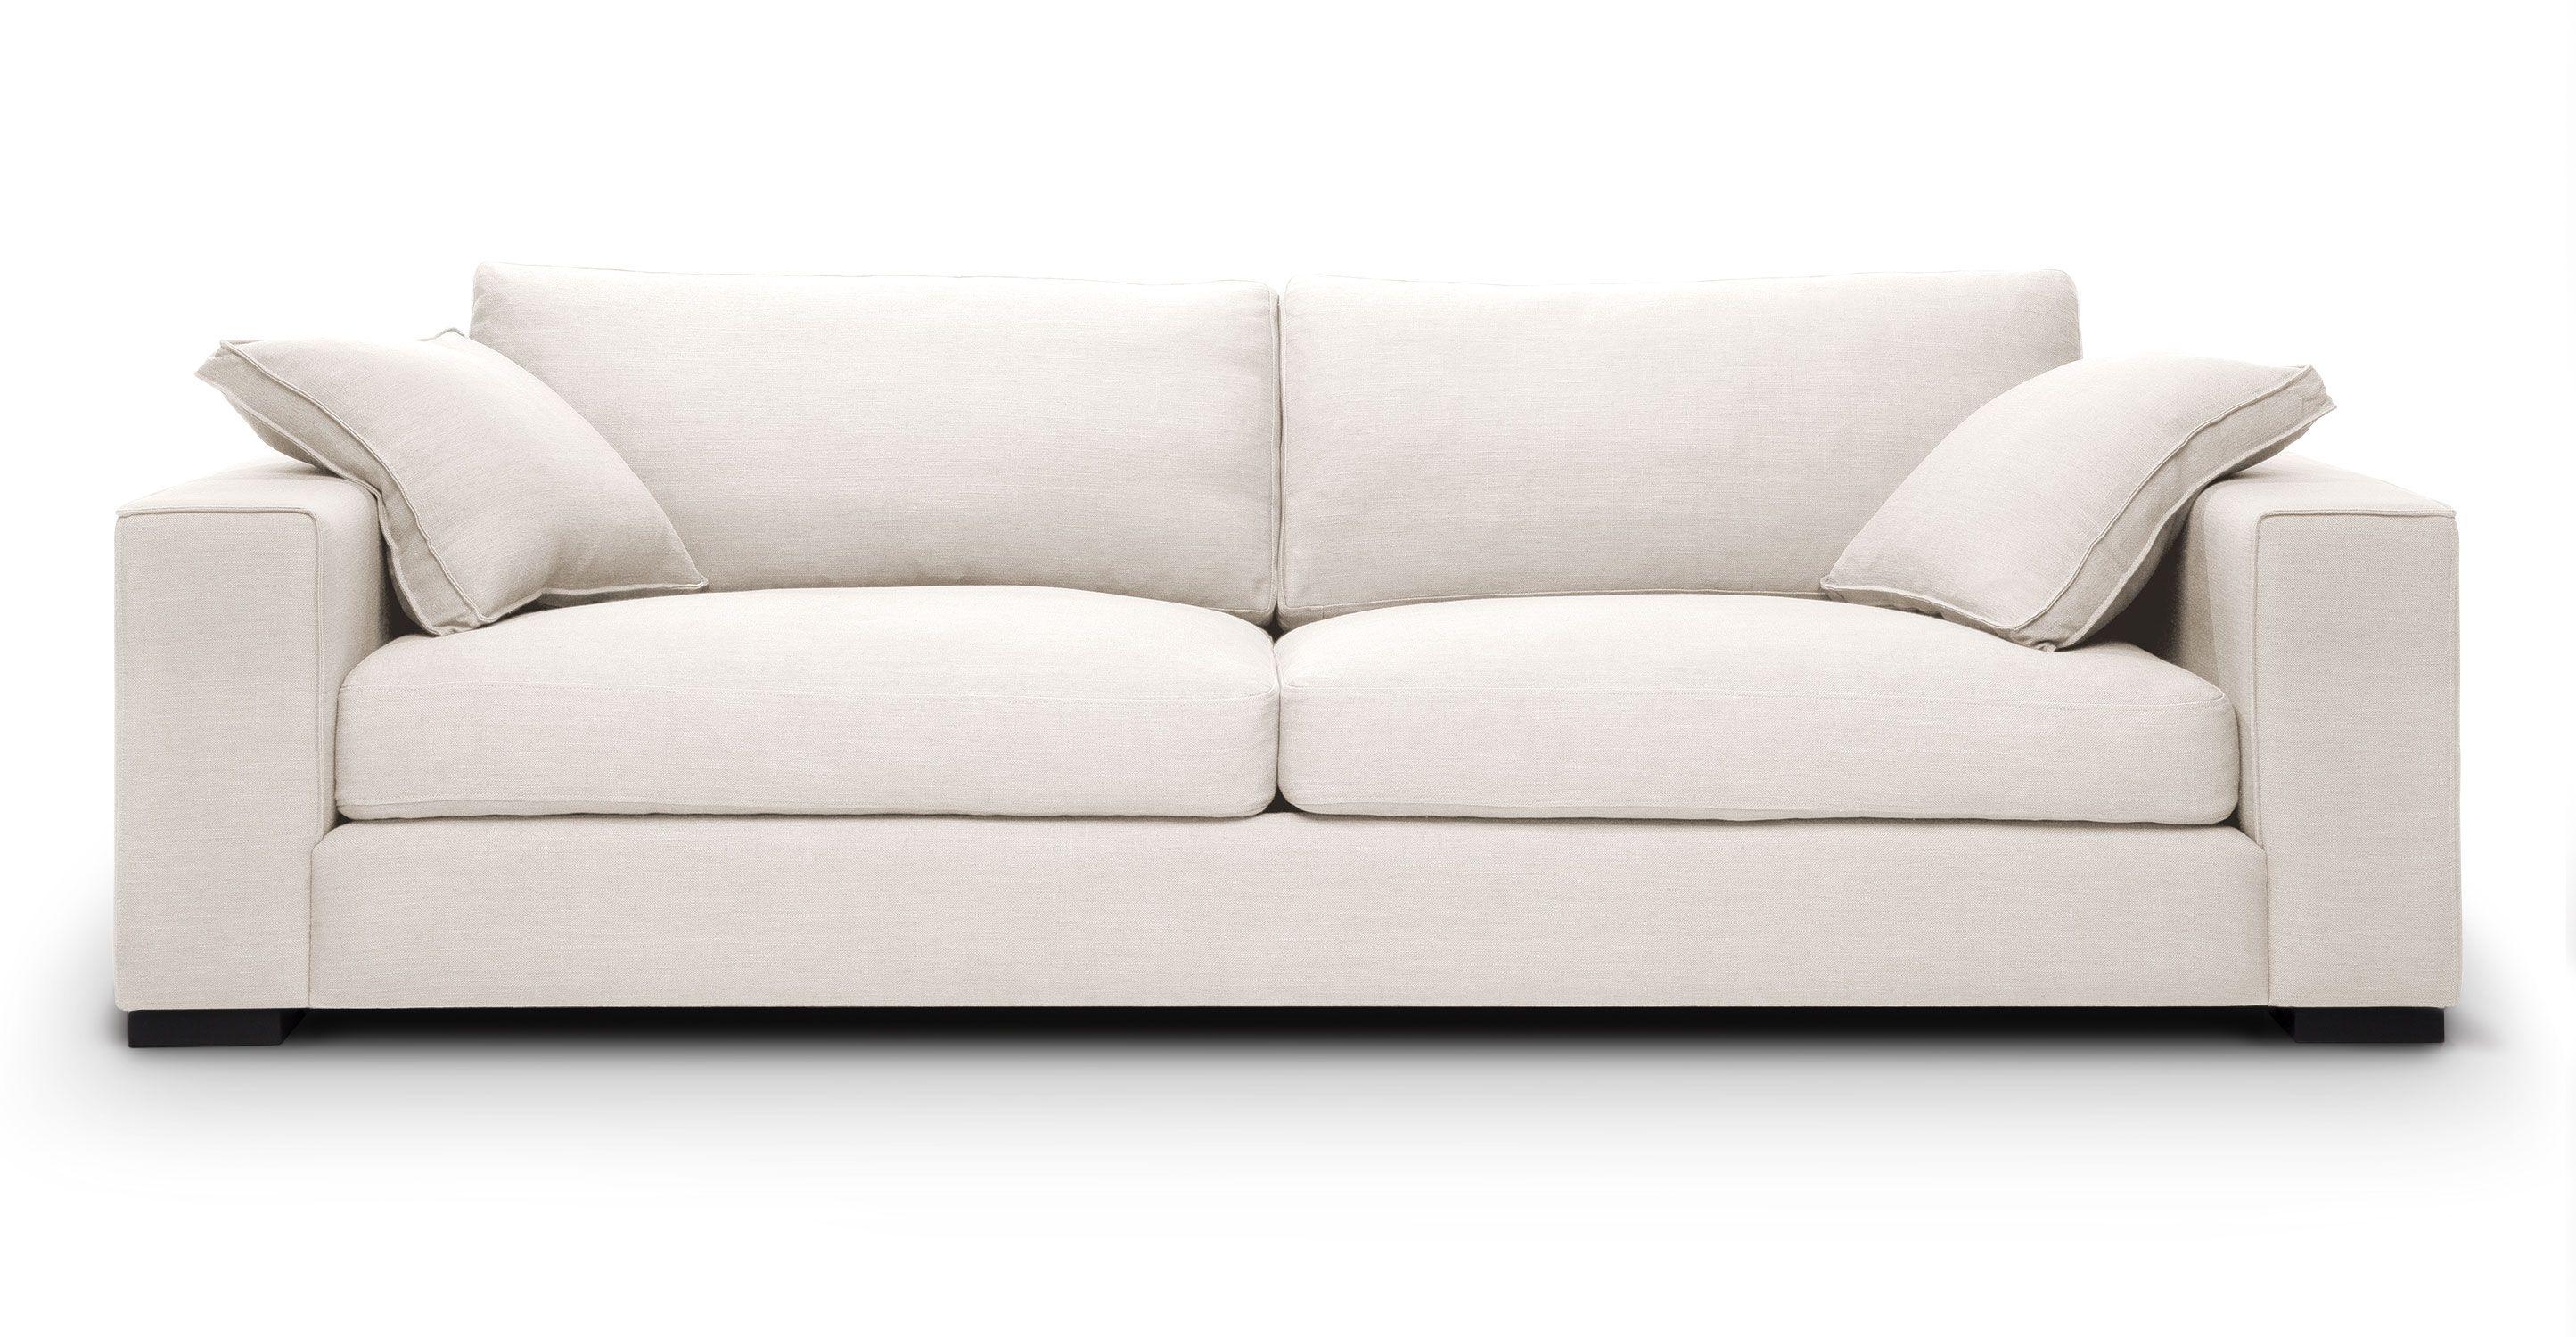 Sitka Quartz White Sofa White sofas, Contemporary sofa